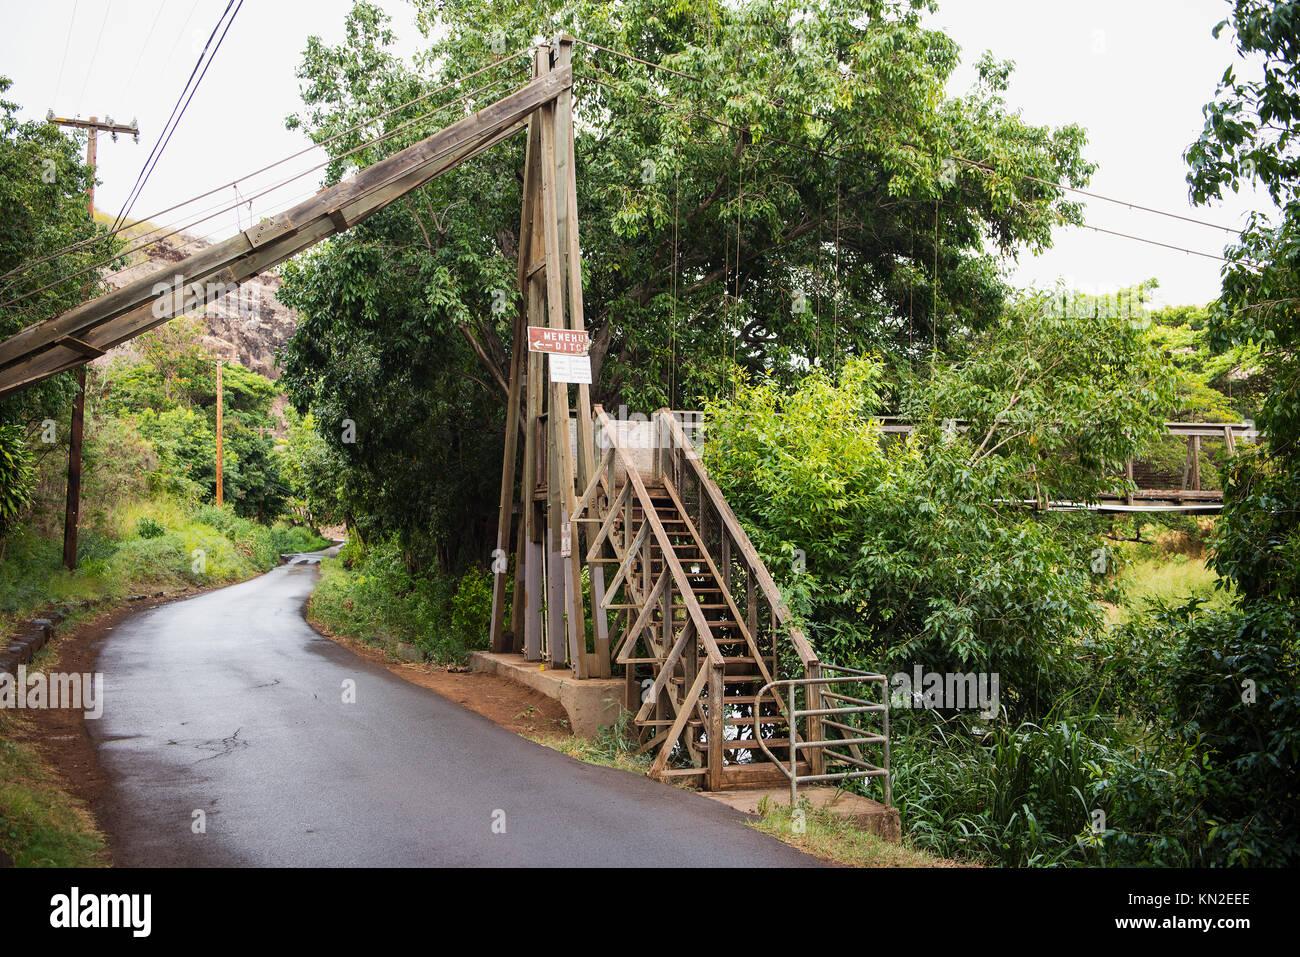 Swing bridge at the Menehune Ditch on Kaua'i Island, Hawai'i - Stock Image